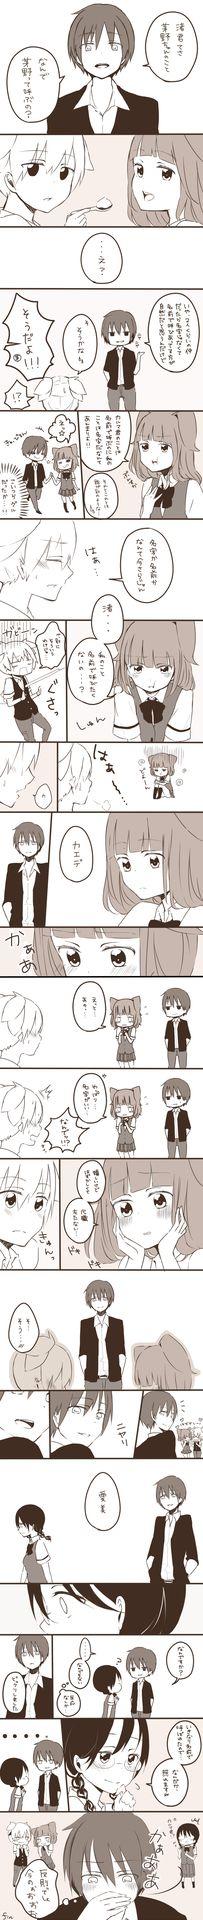 To NagiKae: Karma just pop up on your time XD Damn it To Karmanami: Okuda STRIKE YOUR HART KARMA! XD